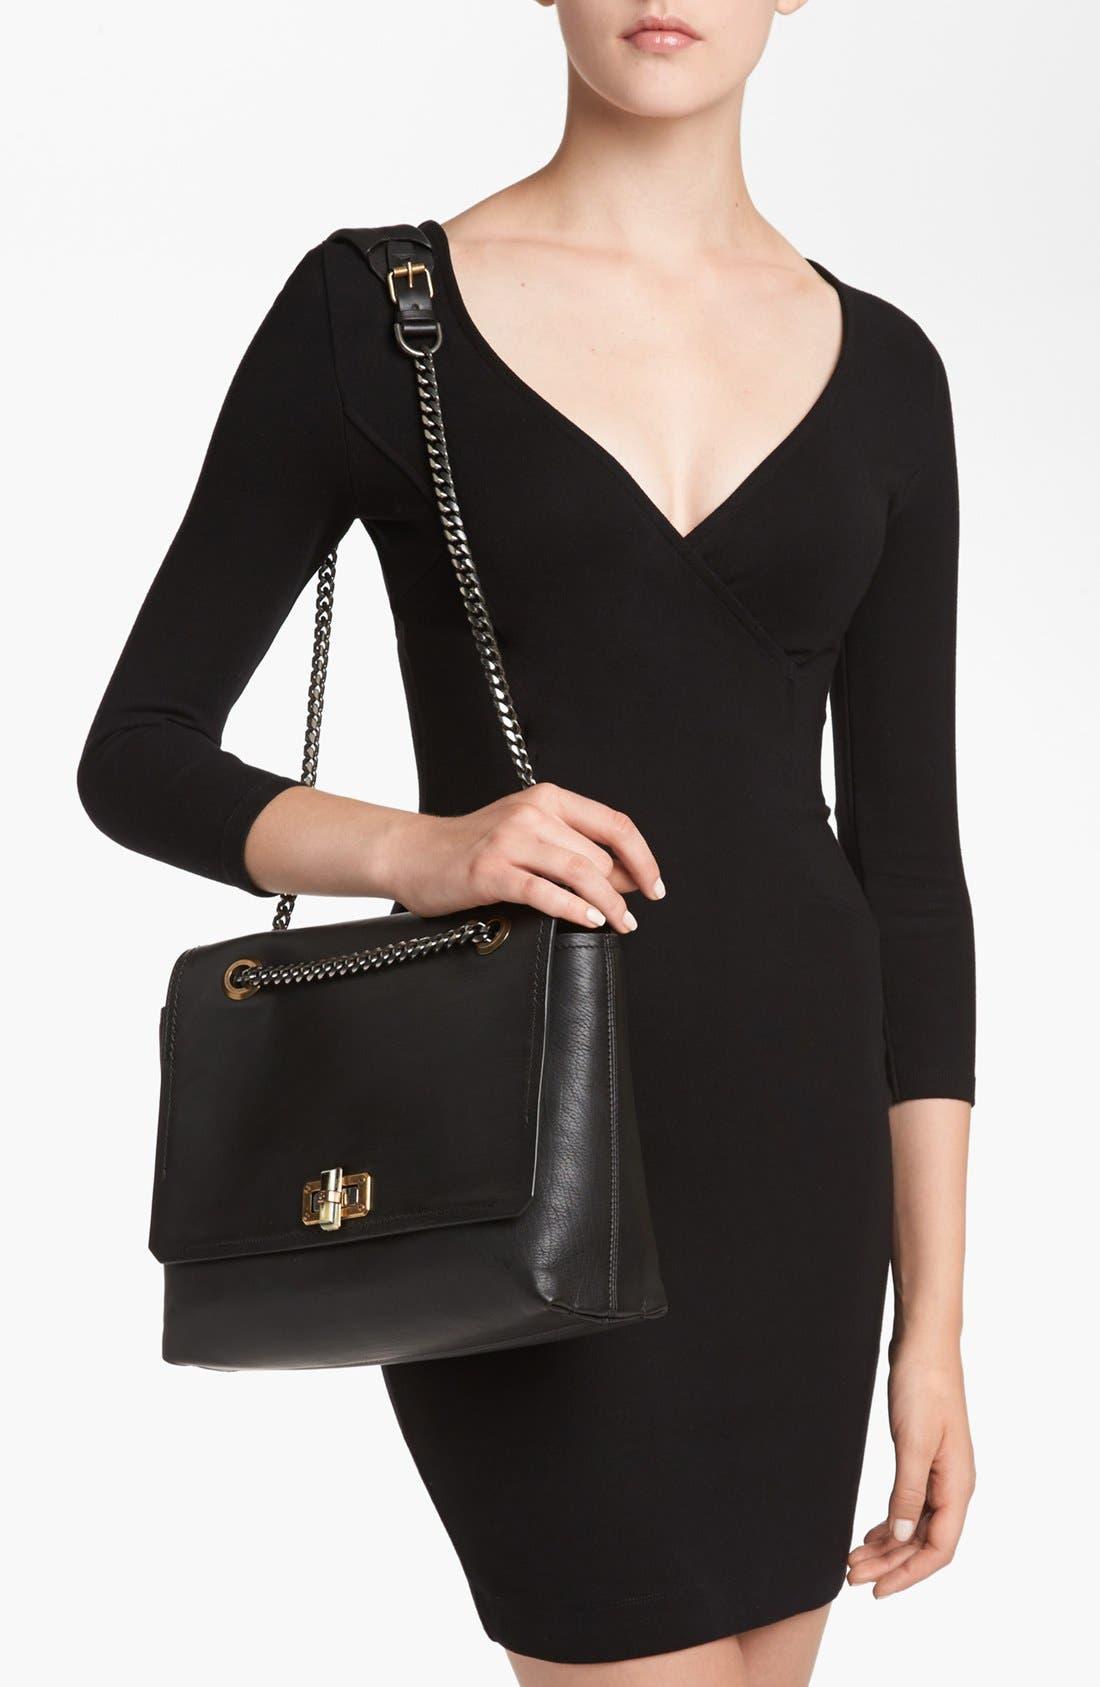 LANVIN,                             'Happy - Medium' Leather Flap Shoulder Bag,                             Alternate thumbnail 3, color,                             001